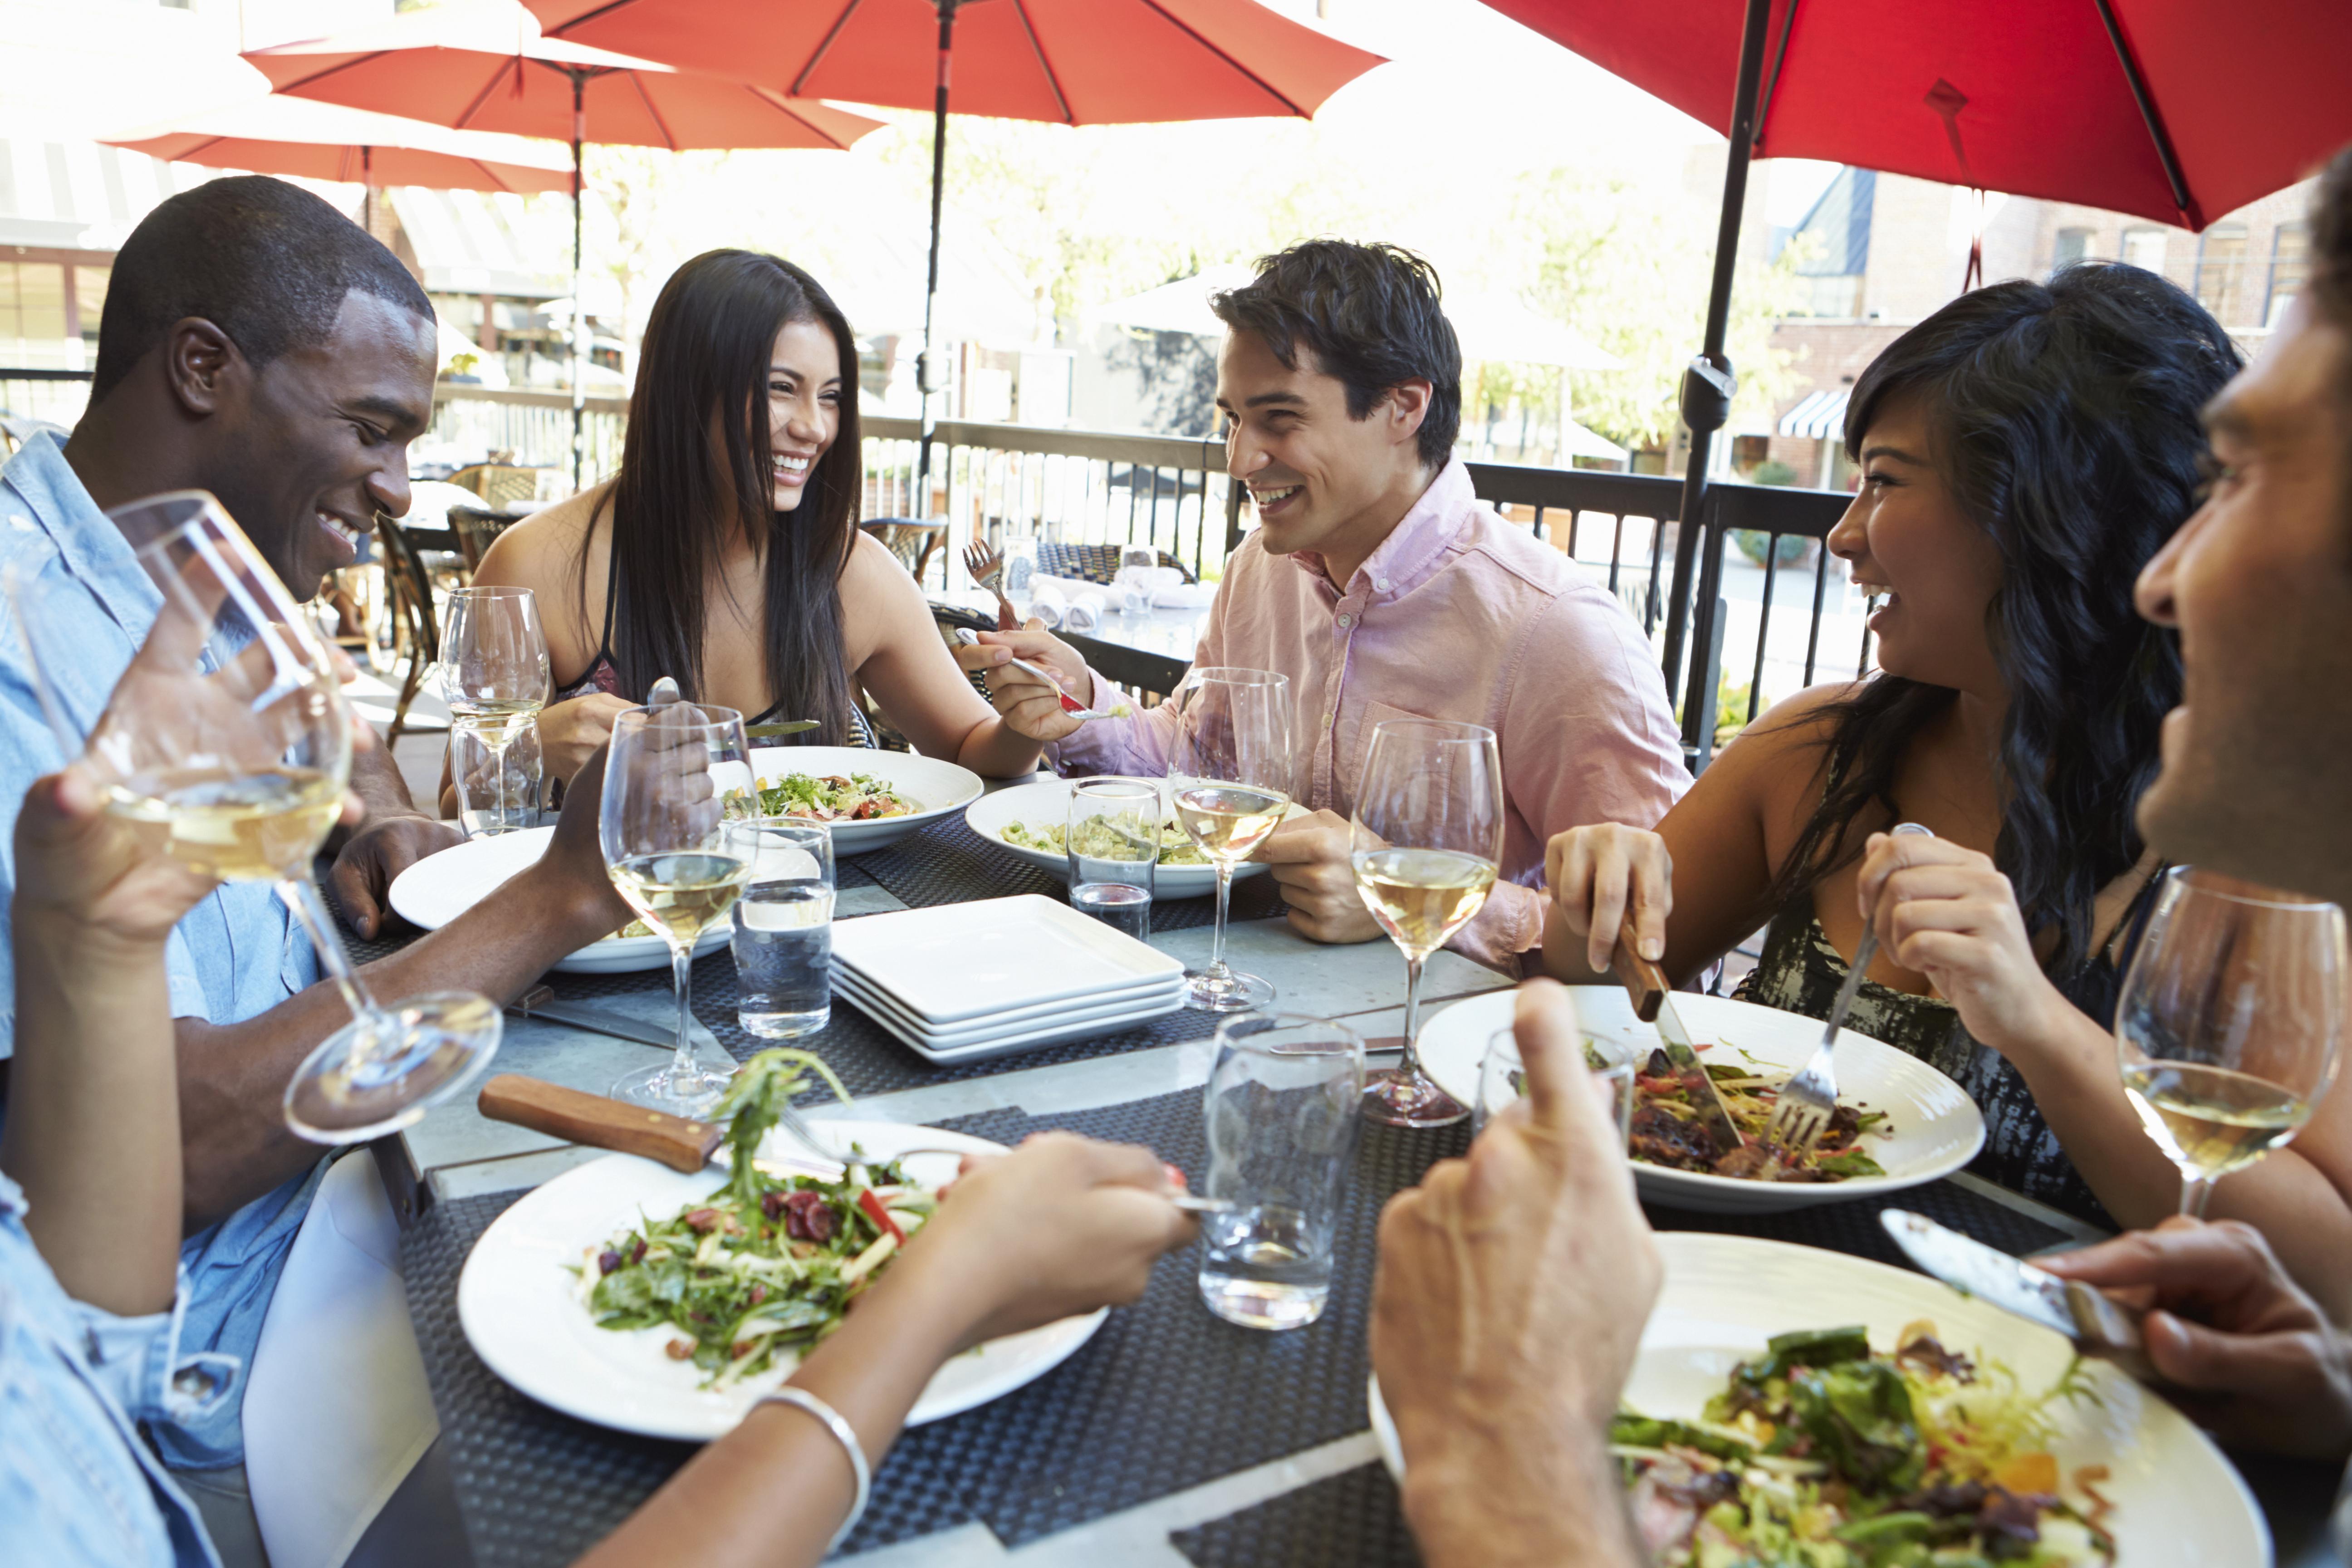 3-simple-effective-instagram-tips-to-improve-your-restaurant-marketing